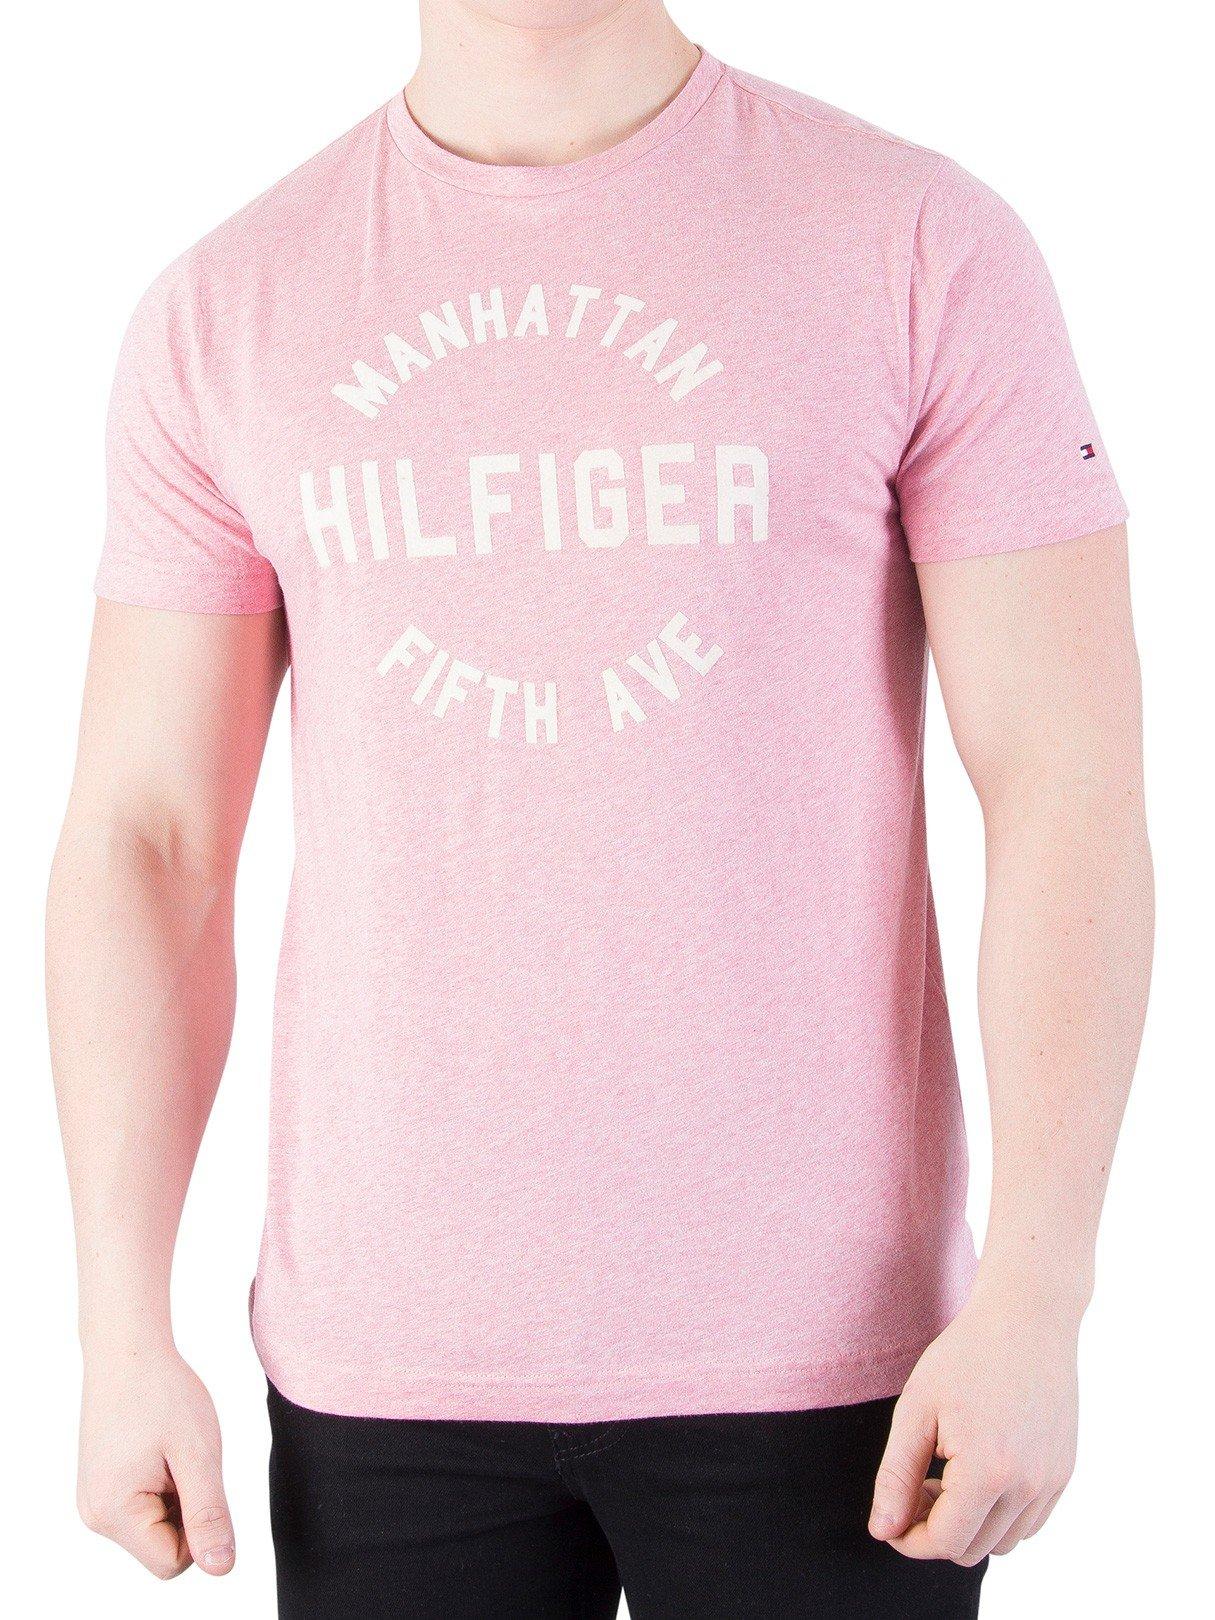 Tommy Hilfiger Owen C-nk tee S/S RF Camiseta para Hombre